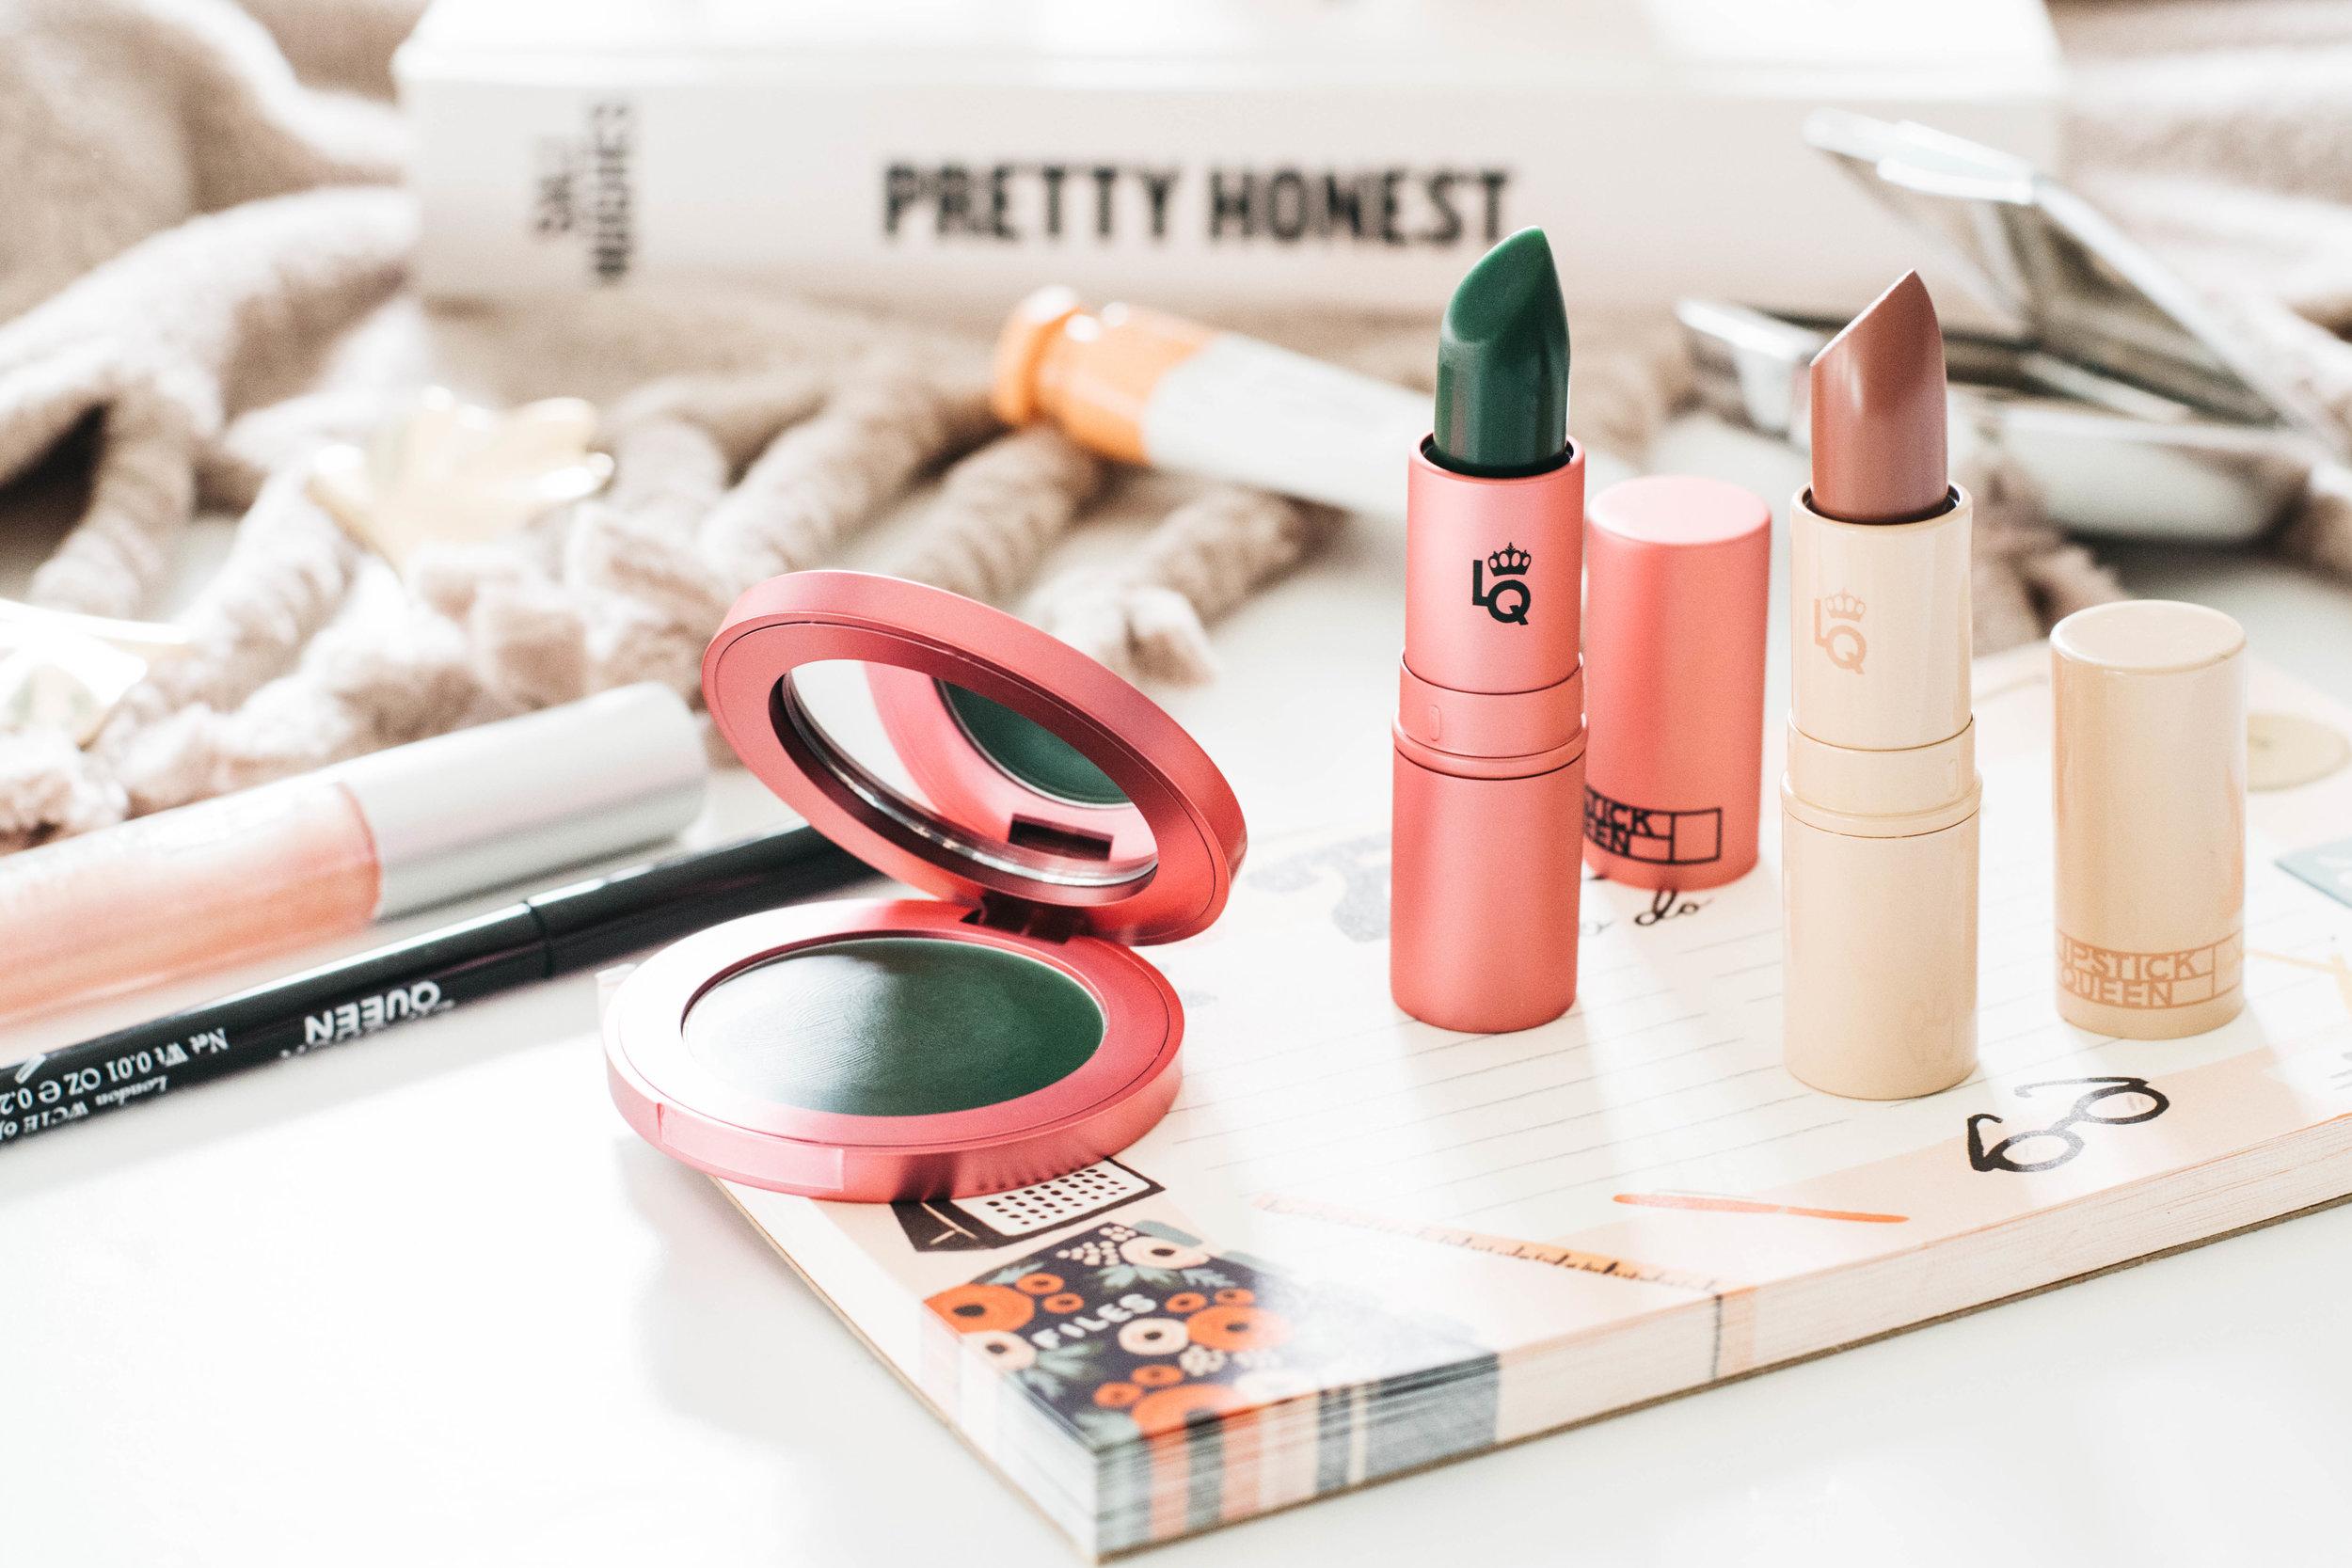 lipstick queen UK review. Manchester, UK beauty and lifestyle blog. Uk travel blog. UK Beauty Blog. Manchester Beauty blog. UK Lifestyle blog. Manchester lifestyle blog. UK Fashion Blog. Manchester Fashion Blog. Ellie Dickinson. Ellie Grace. Ellie Grace Dickinson.